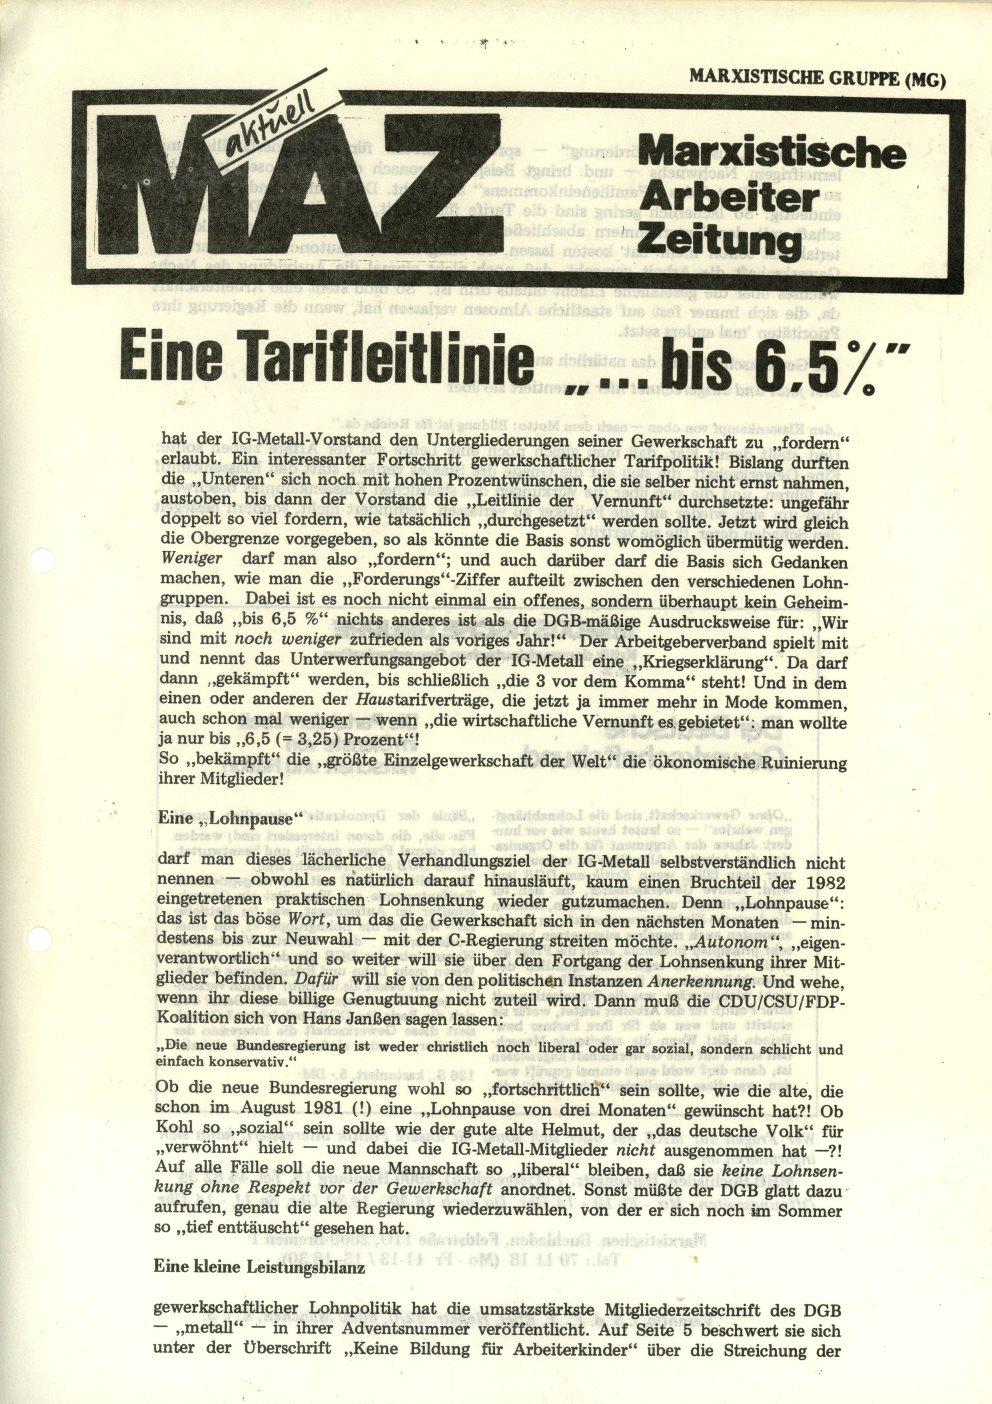 Hamburg_MG_MAZ_19821200_aktuell_01